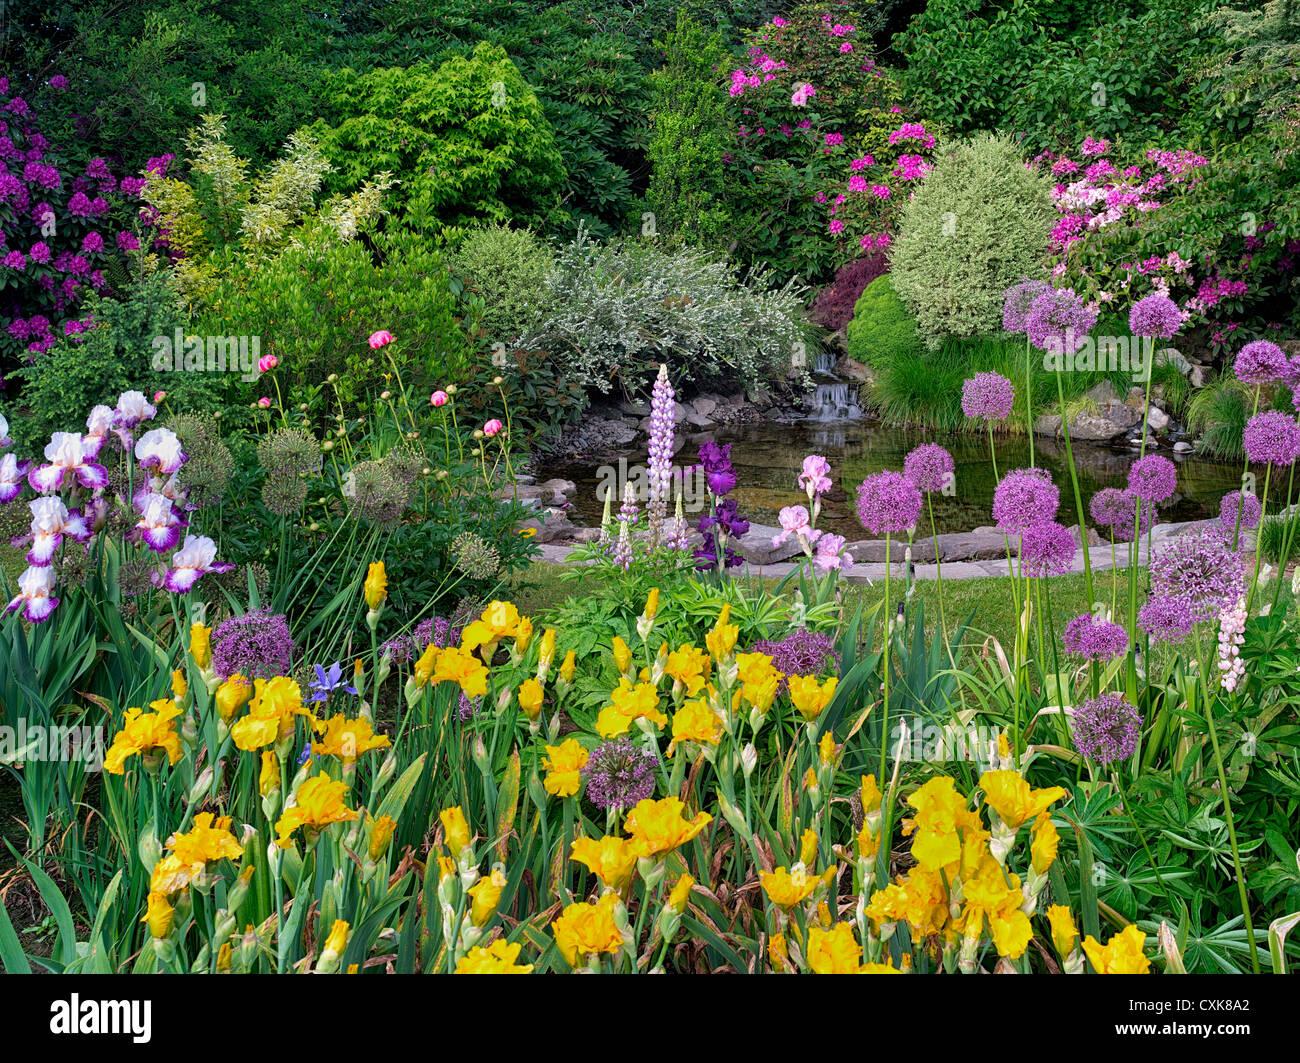 Bassin avec jardin fleuri. Schrieners Iris Gardens, Salem, Oregon. Photo Stock